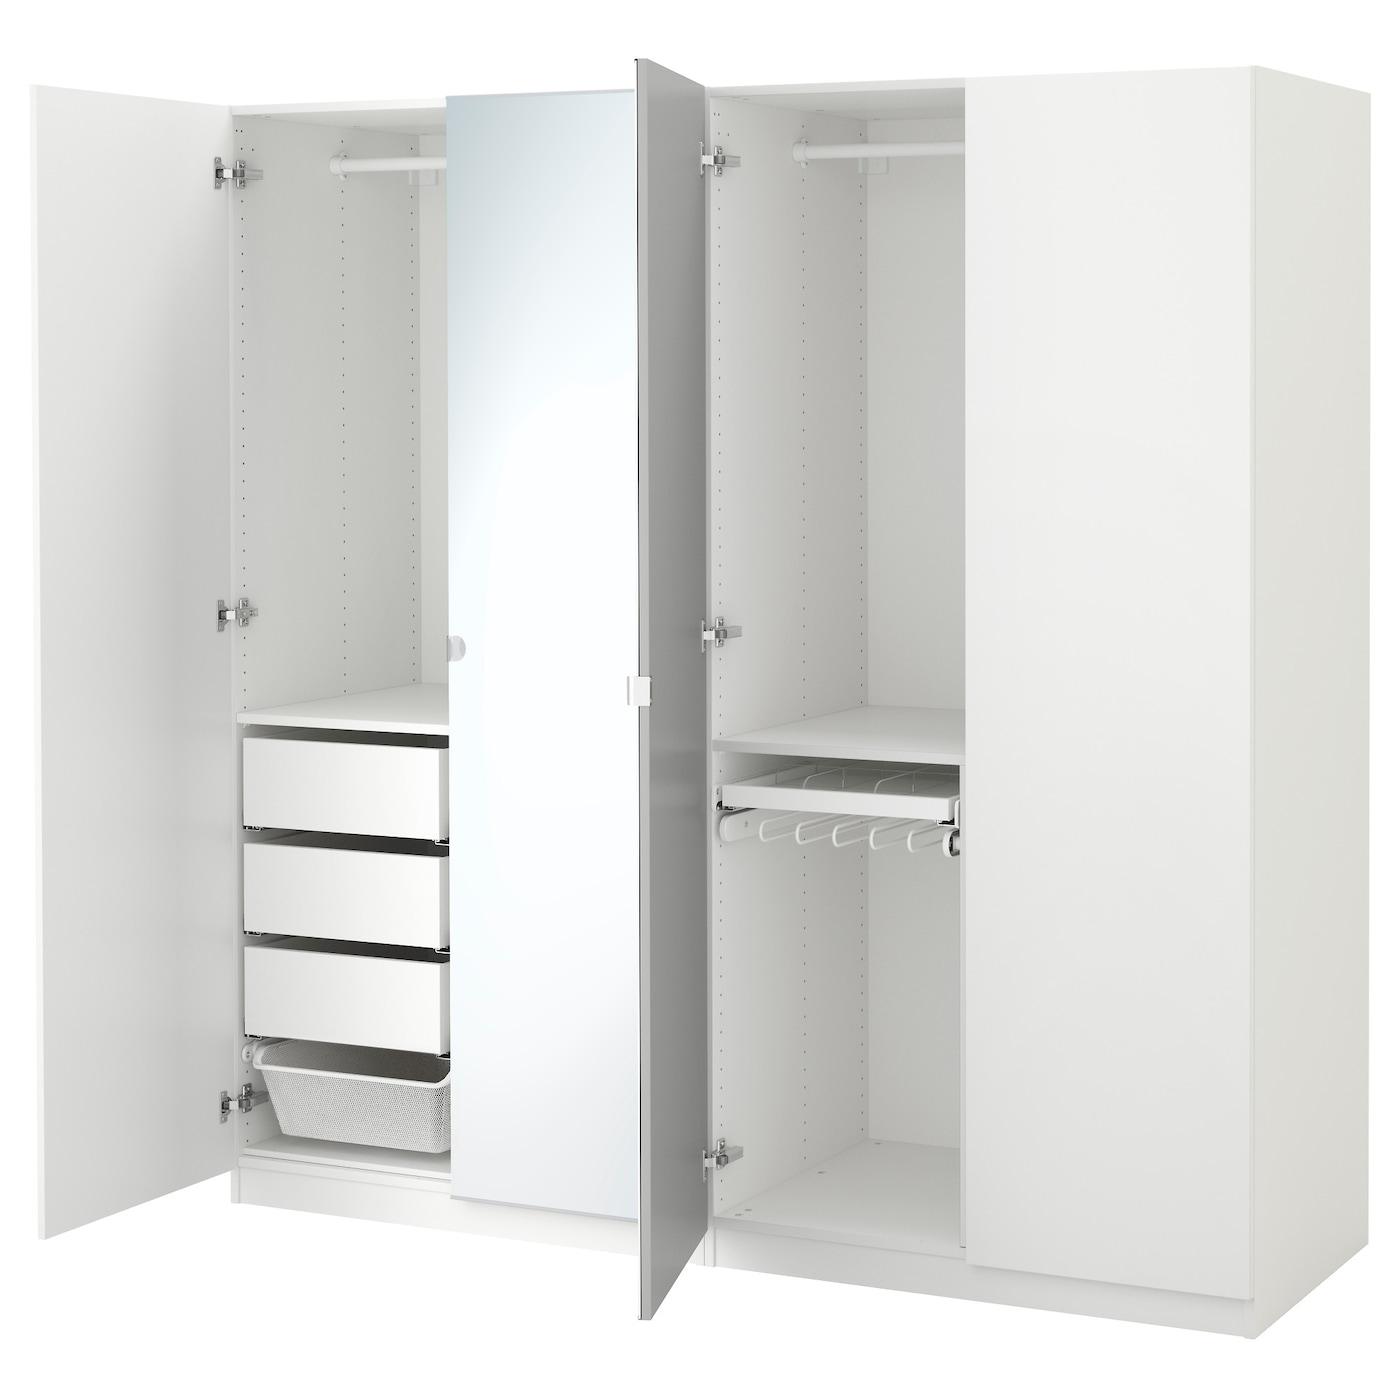 Pax Wardrobe White Forsand Vikedal Ikea